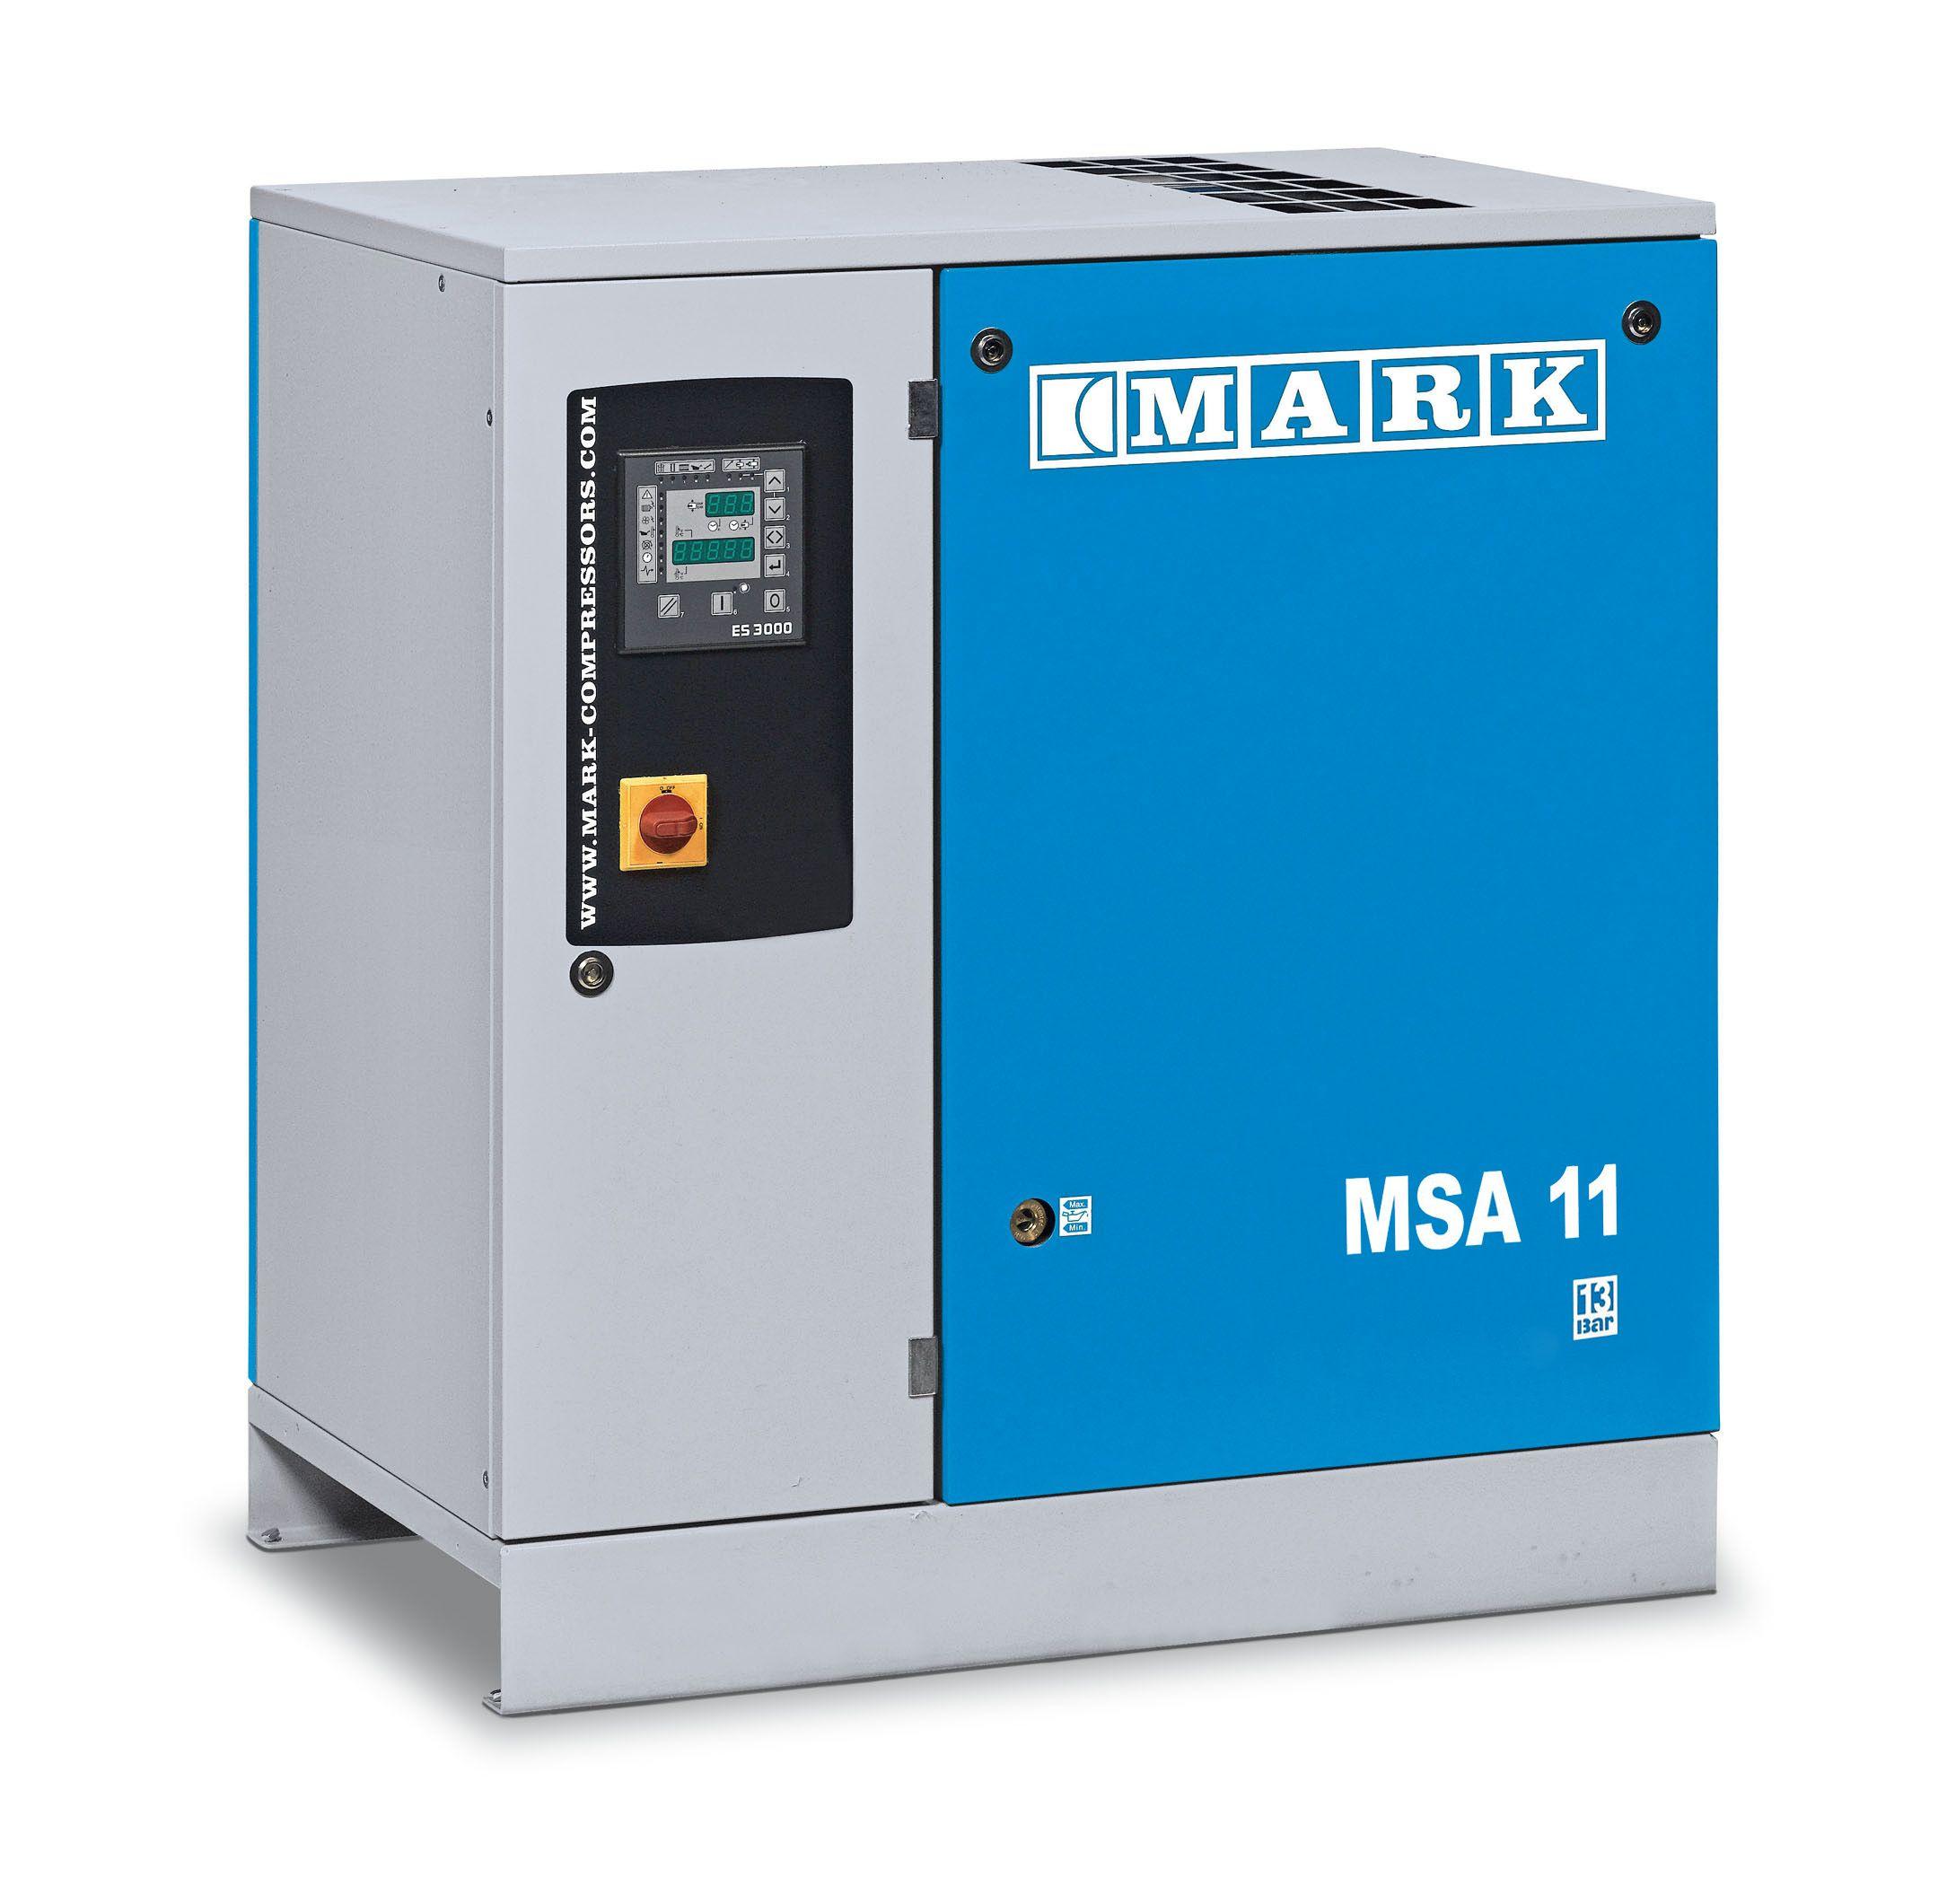 mark-msa-screw-compressor-base-only